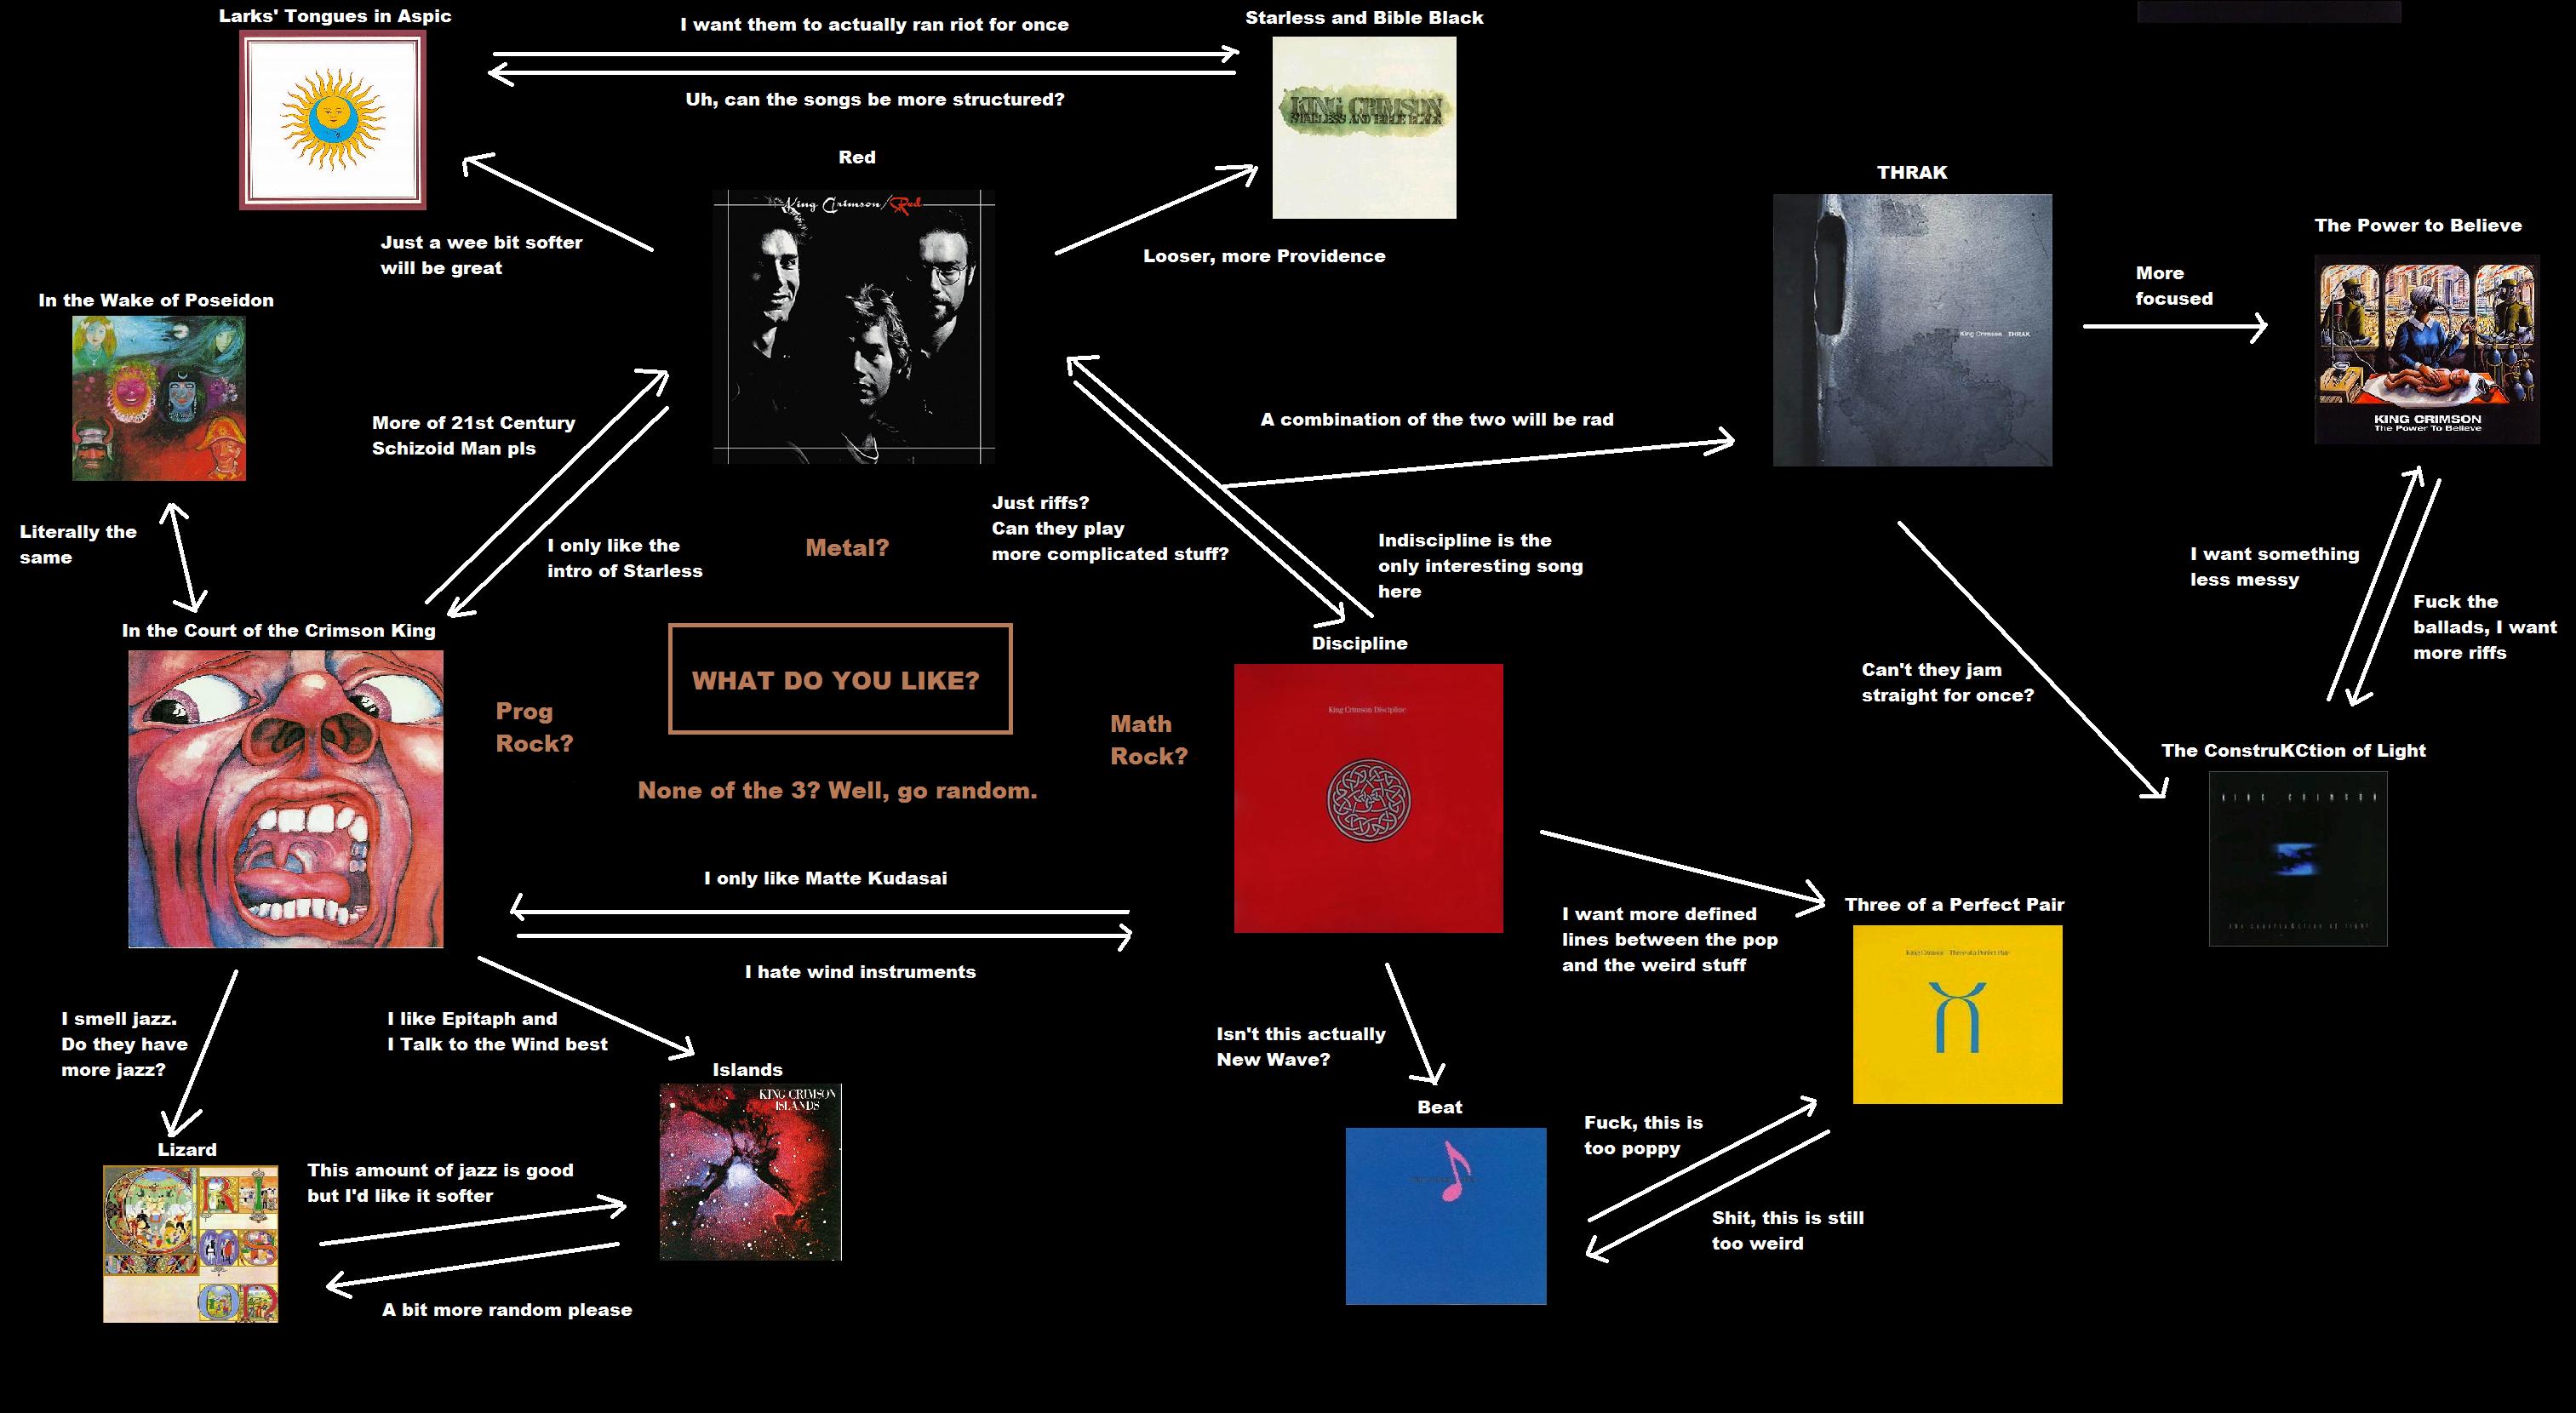 Flowcharts 4chanmusic Wiki Fandom In 2021 King Crimson Greg Lake Omar Rodriguez Lopez